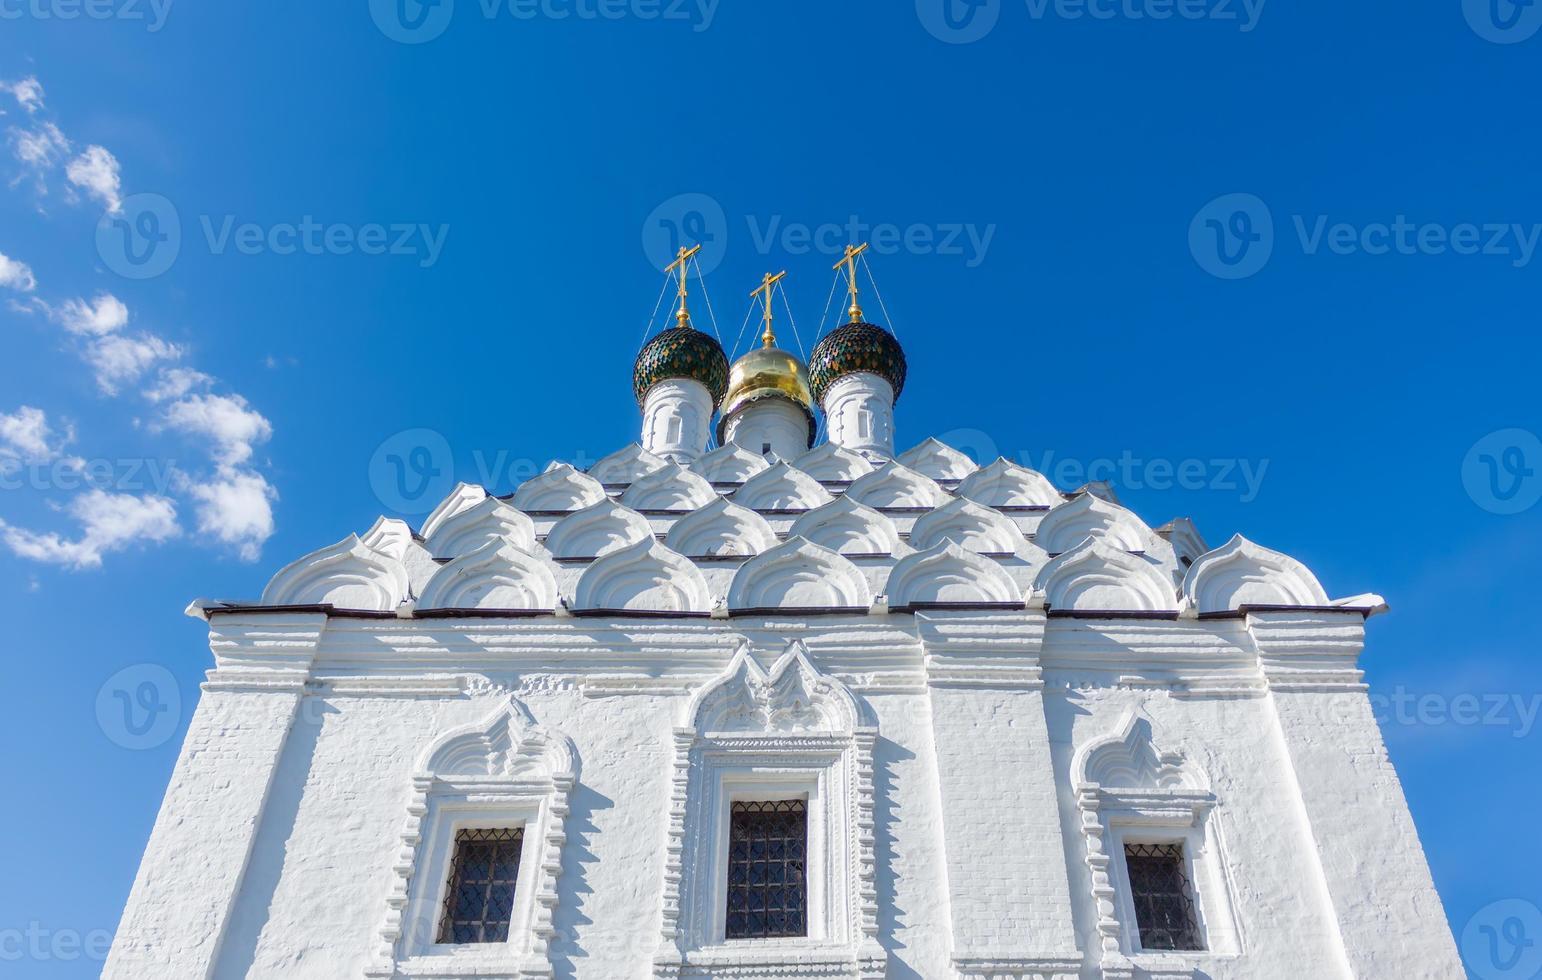 koepels en kokoshniks van de kerk in kolomna op foto